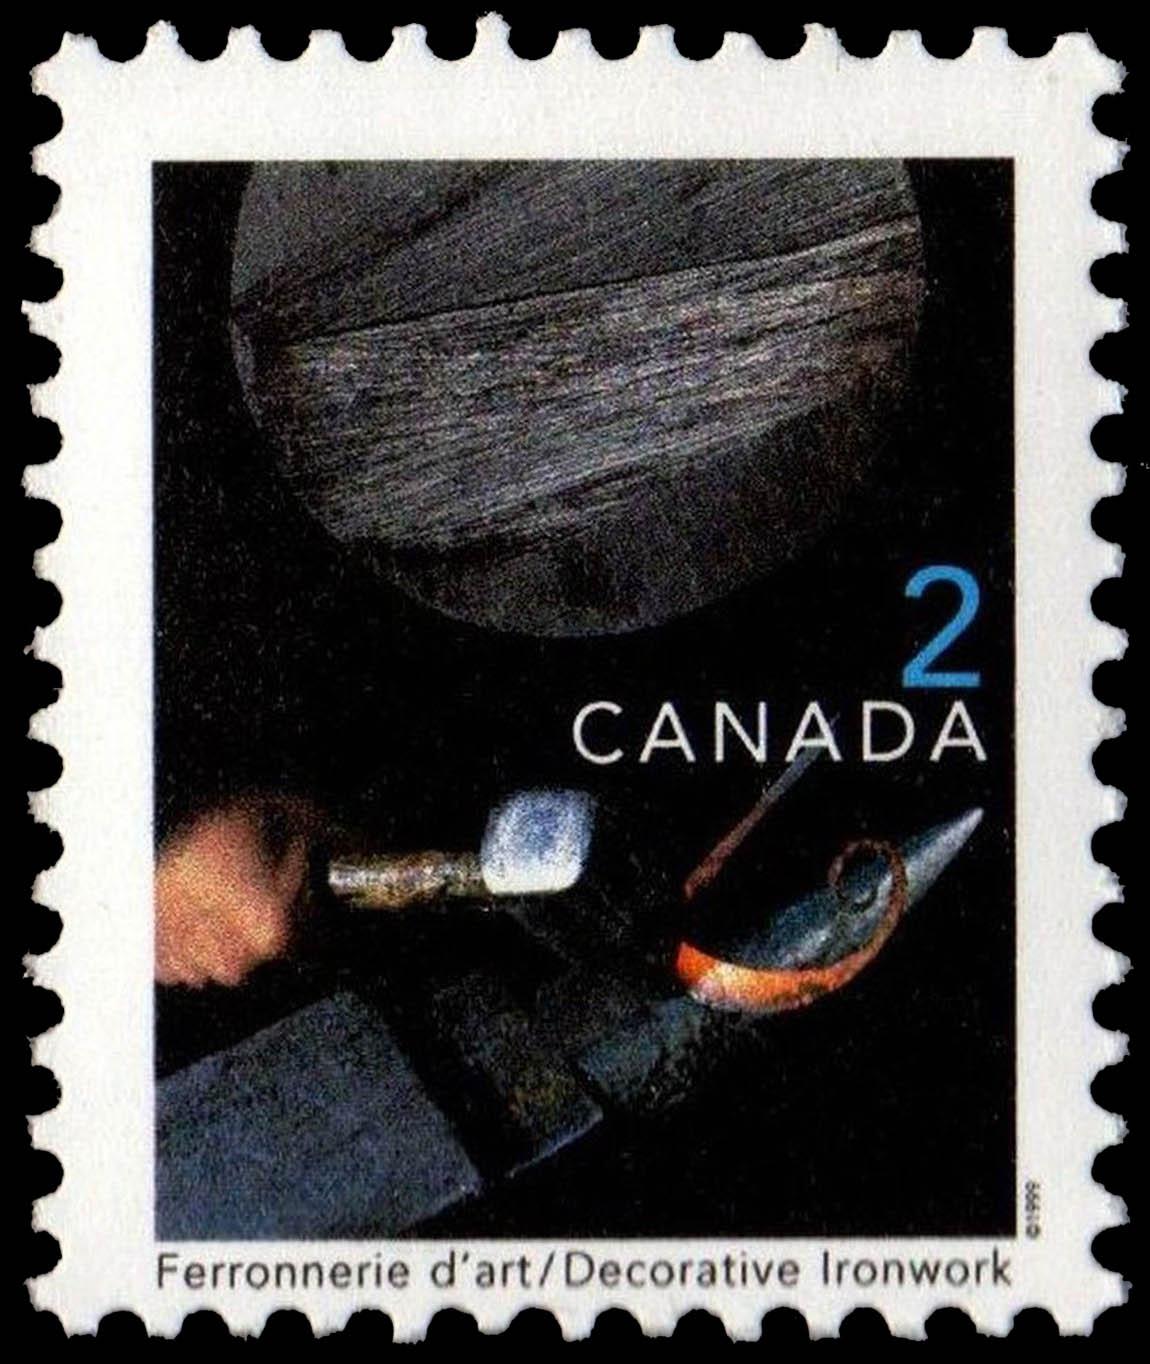 Decorative Ironwork Canada Postage Stamp   Traditional Trades